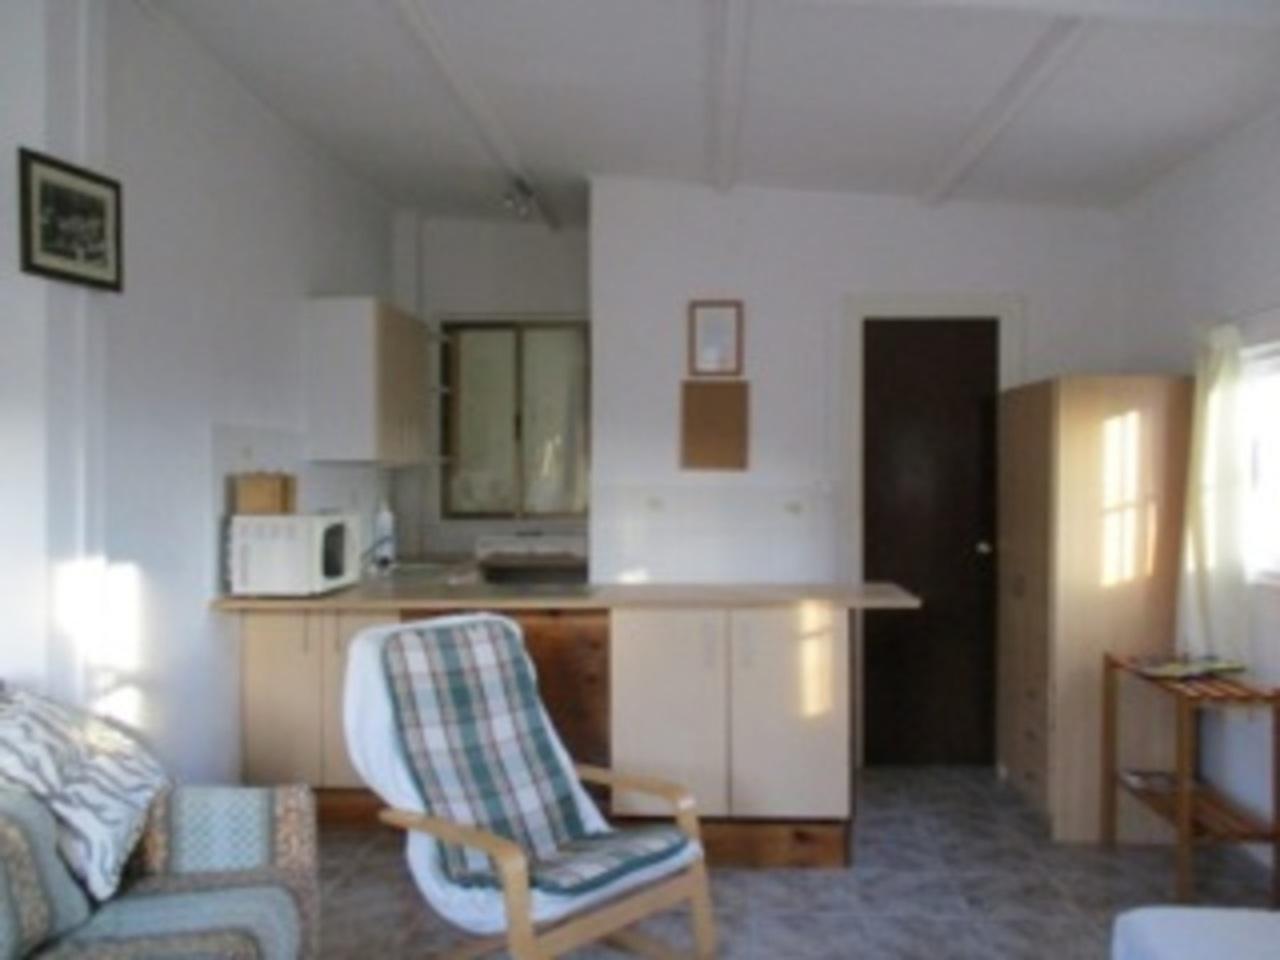 Ref: AP983 4 Bedrooms Price 250,000 Euros